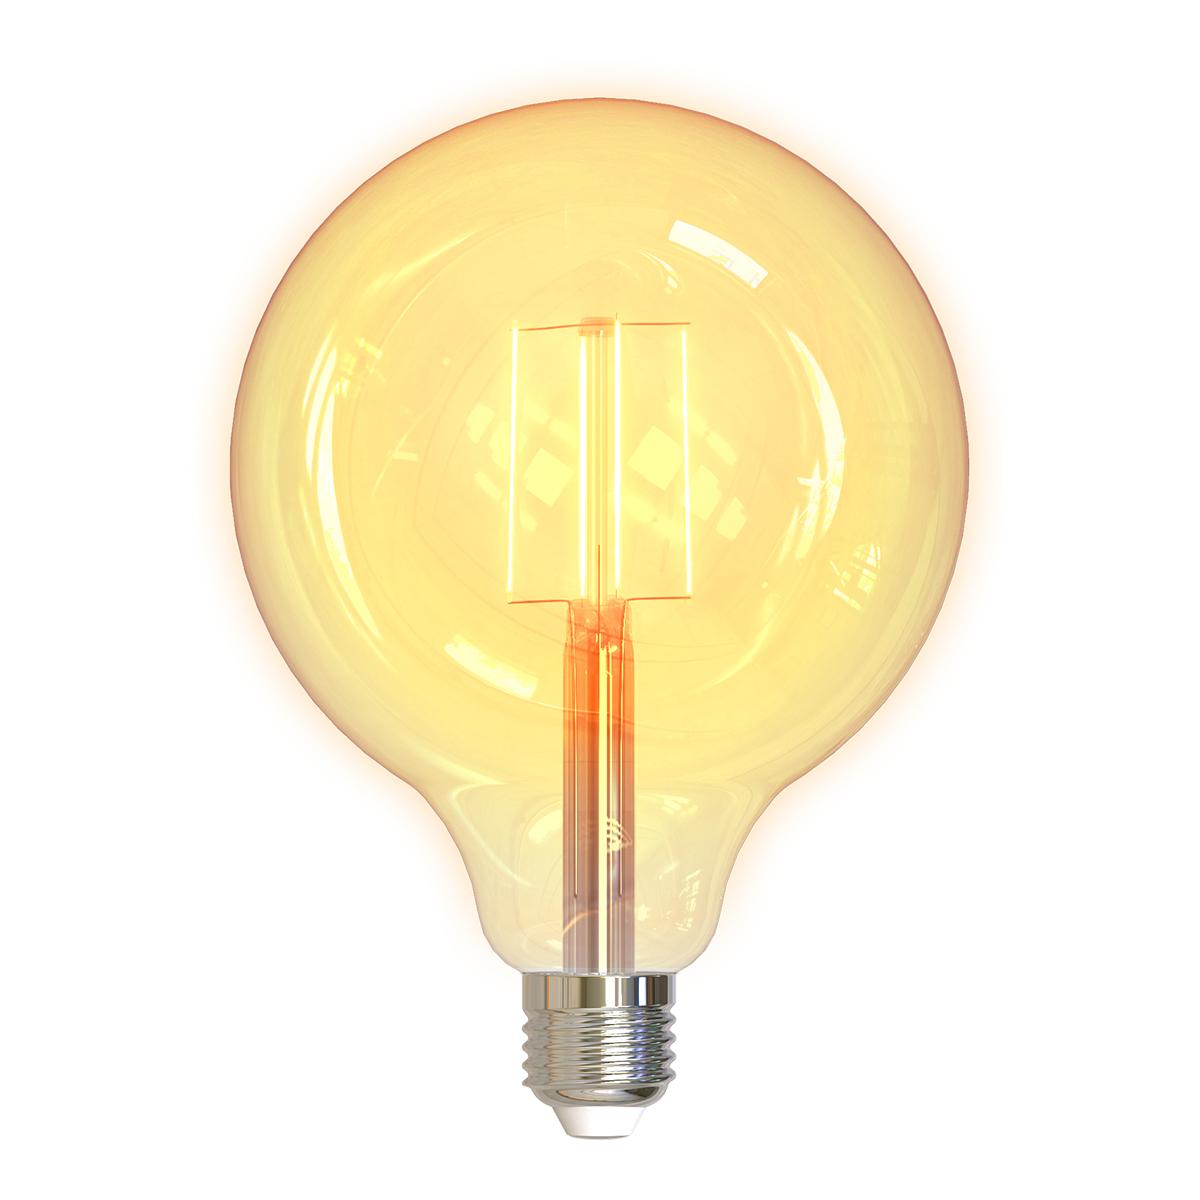 Deltaco Smart Home LED-lampa, E27, WiFi, 5.5W, dimbar